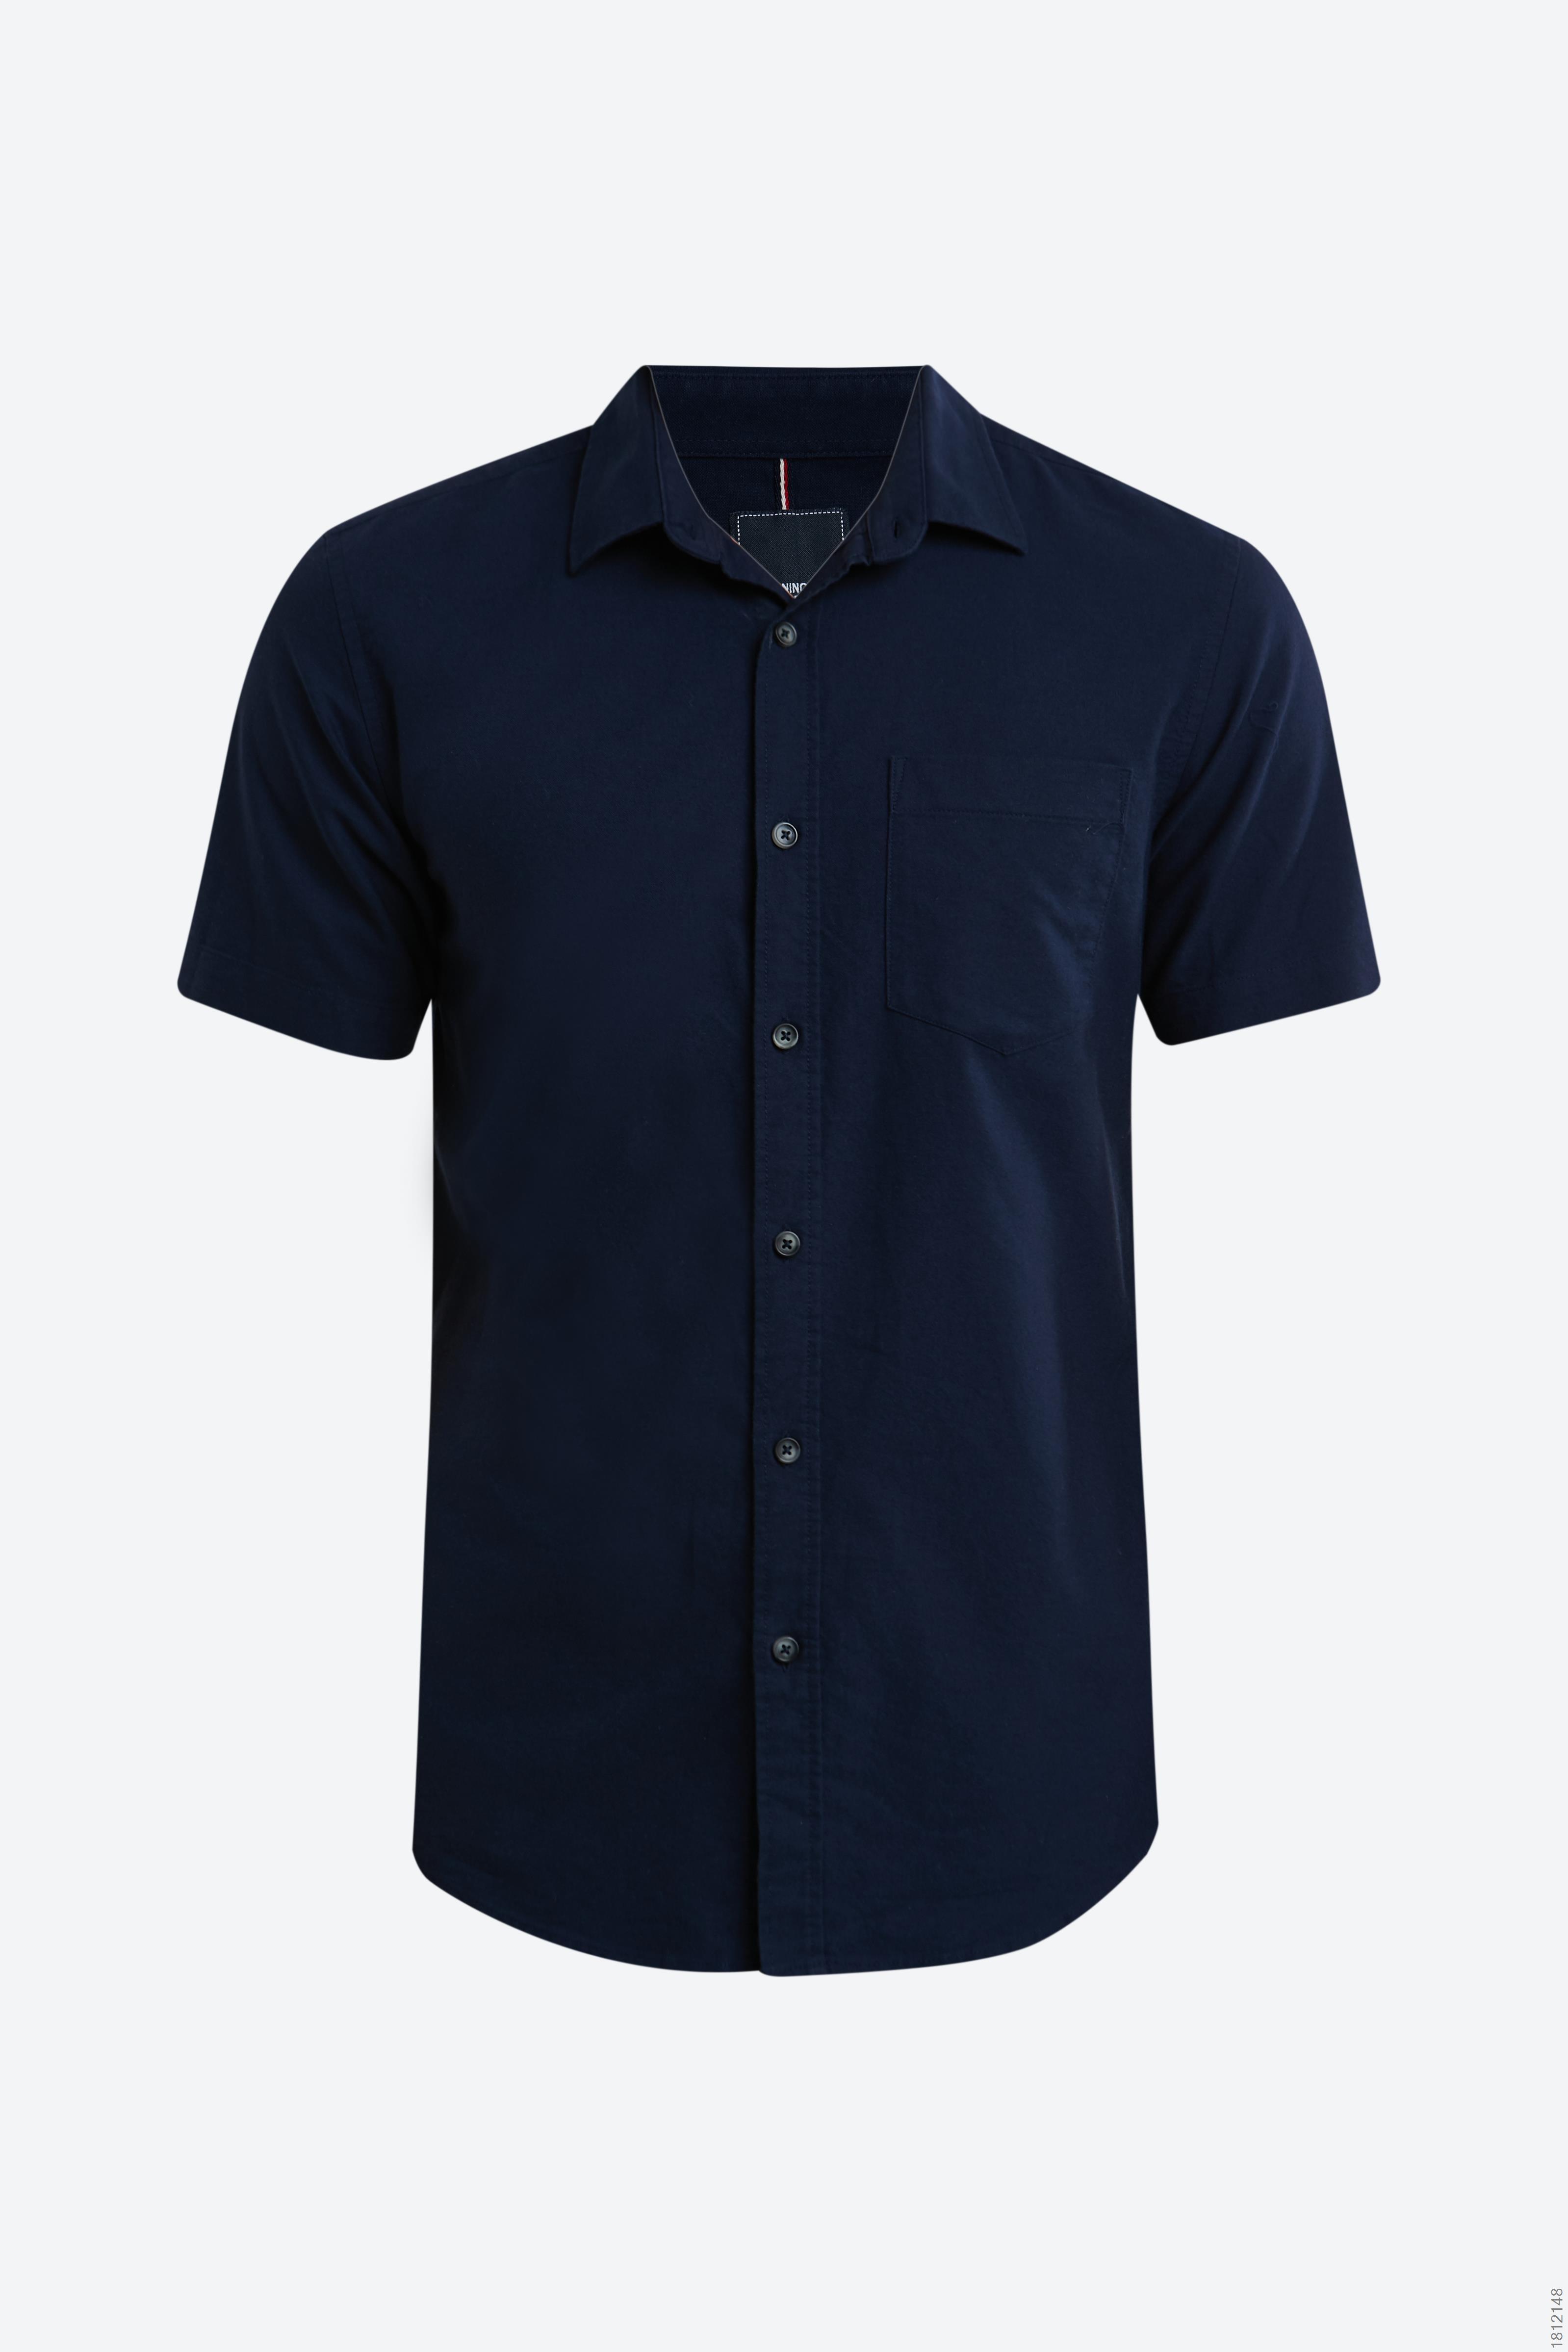 áo sơmi nam - 1812148